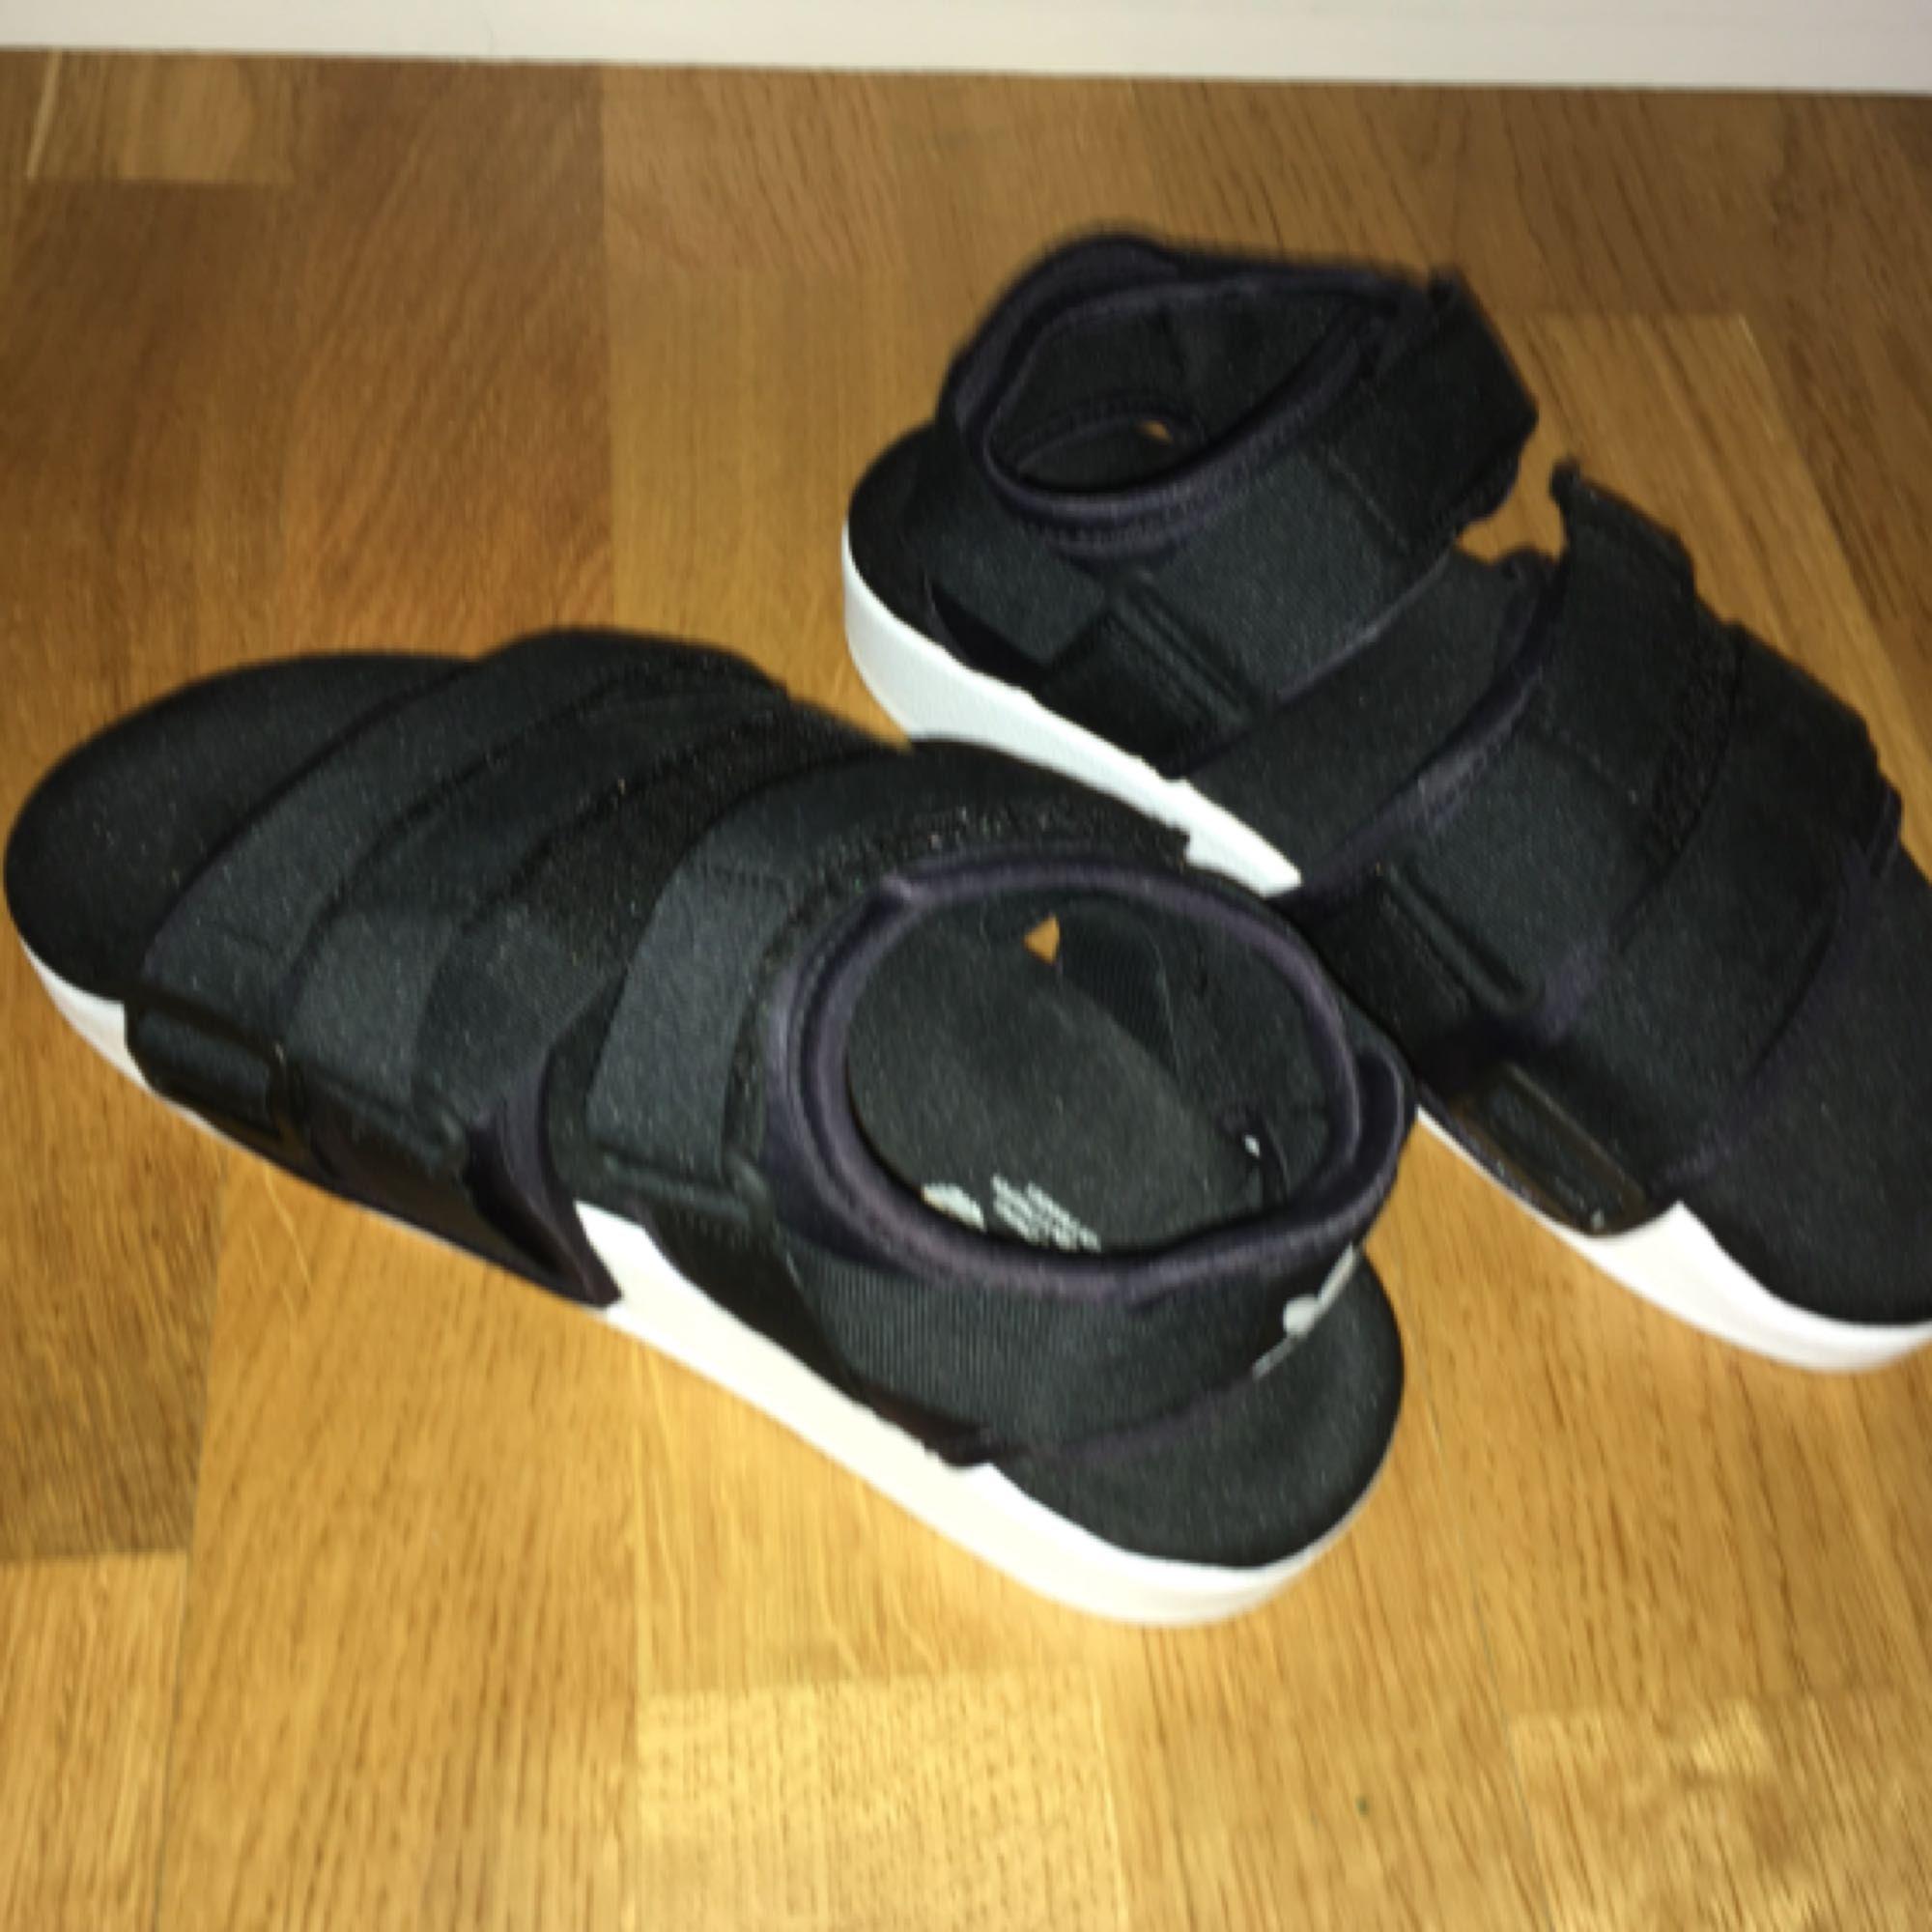 ffc67dbc2c83 Endast för upphämtning i Sthlm. Adidas originals adilette chunky strap  sandal. Aldrig använda! Endast för upphämtning i Sthlm.